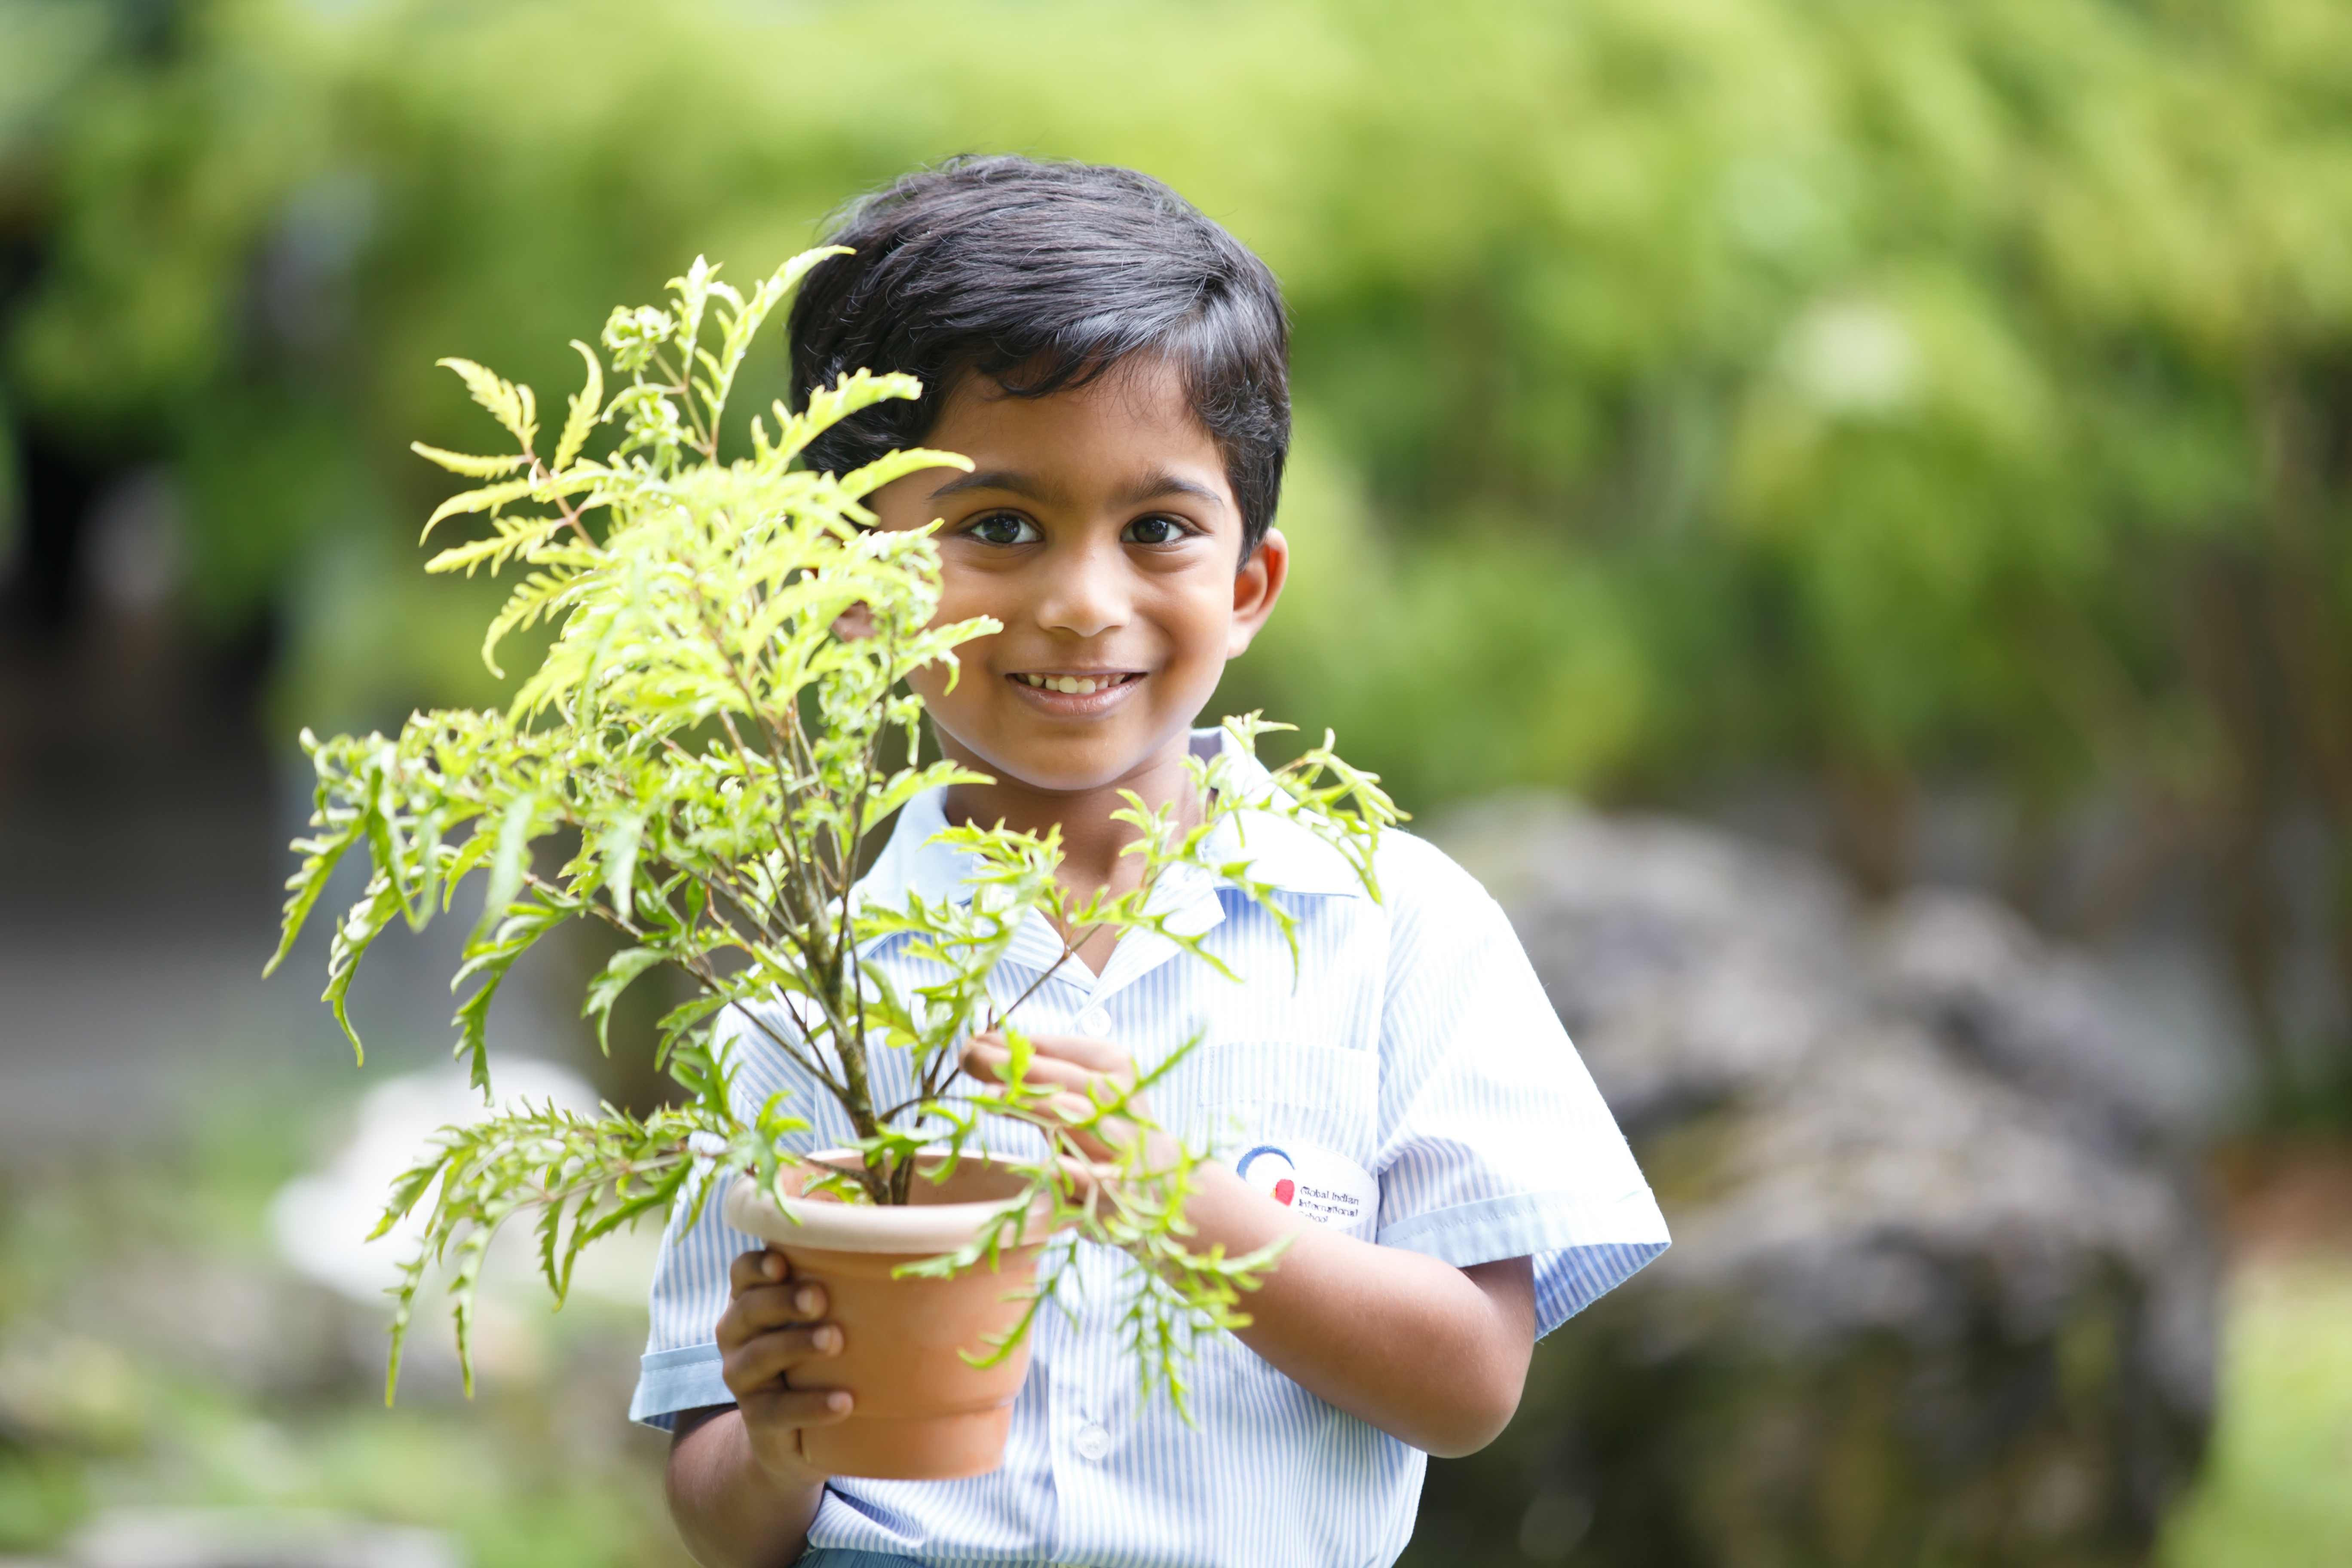 How volunteering helps kids